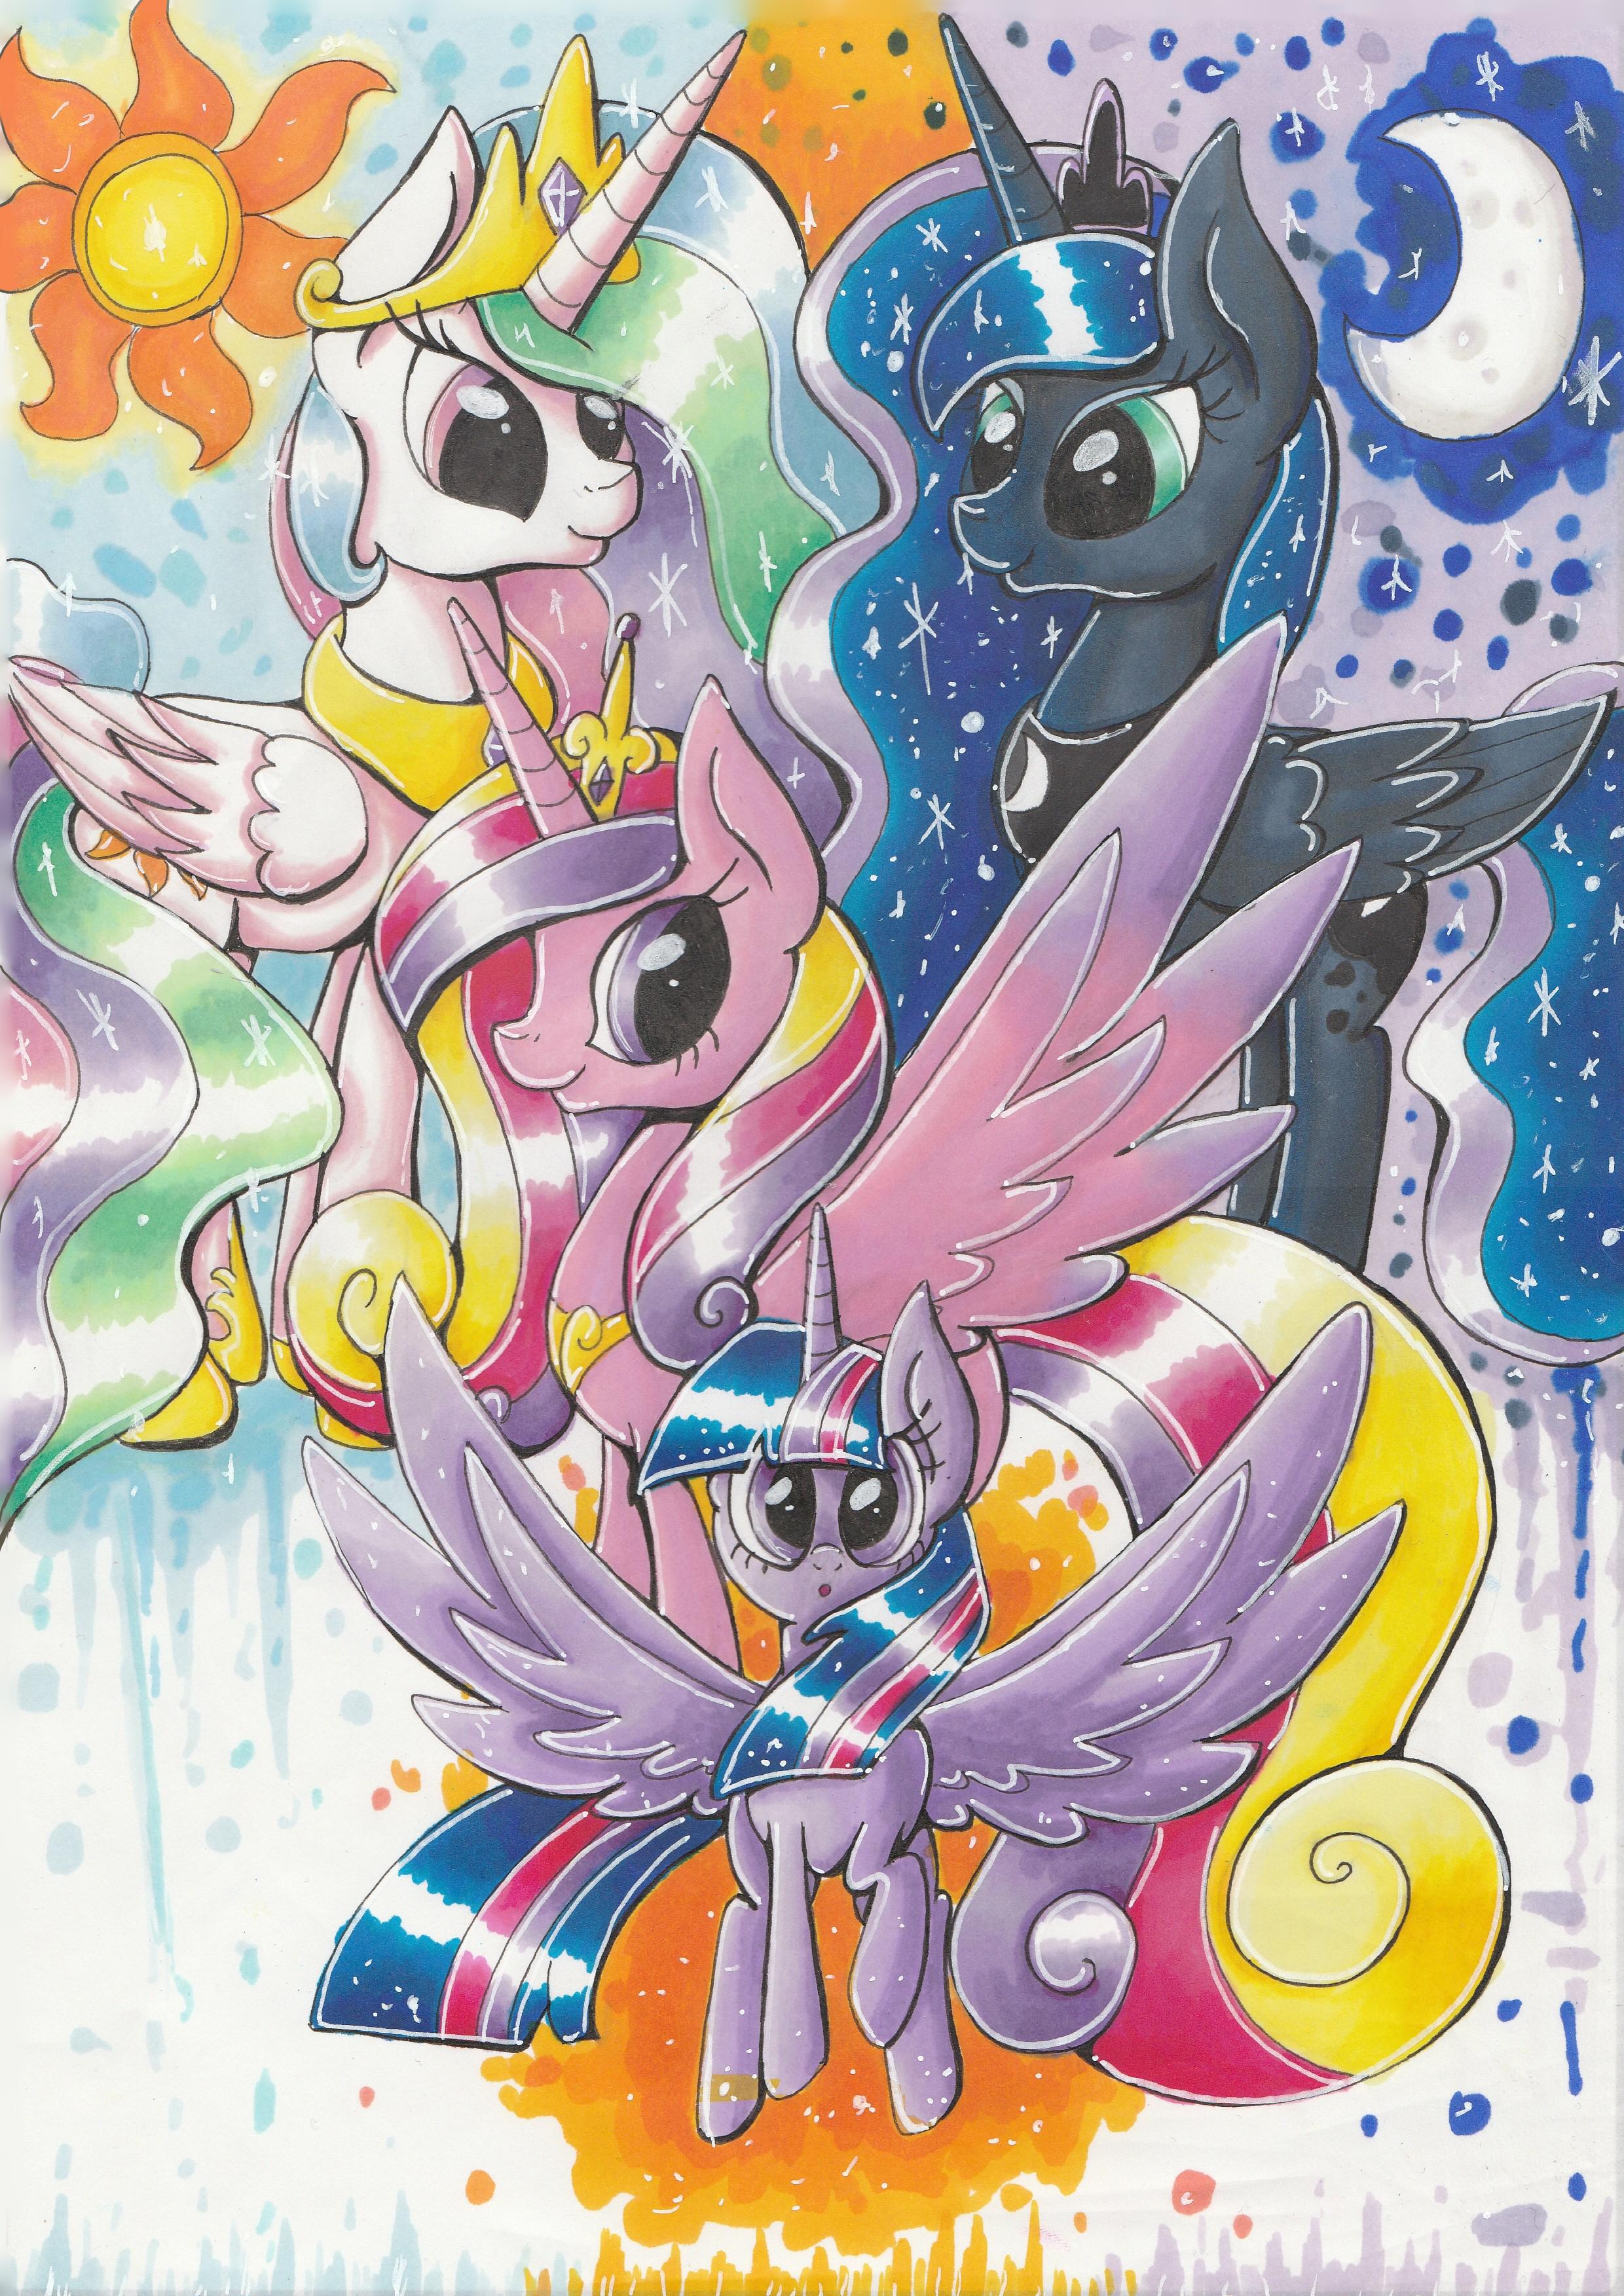 Princesses of Equestria by PumpkinKikile